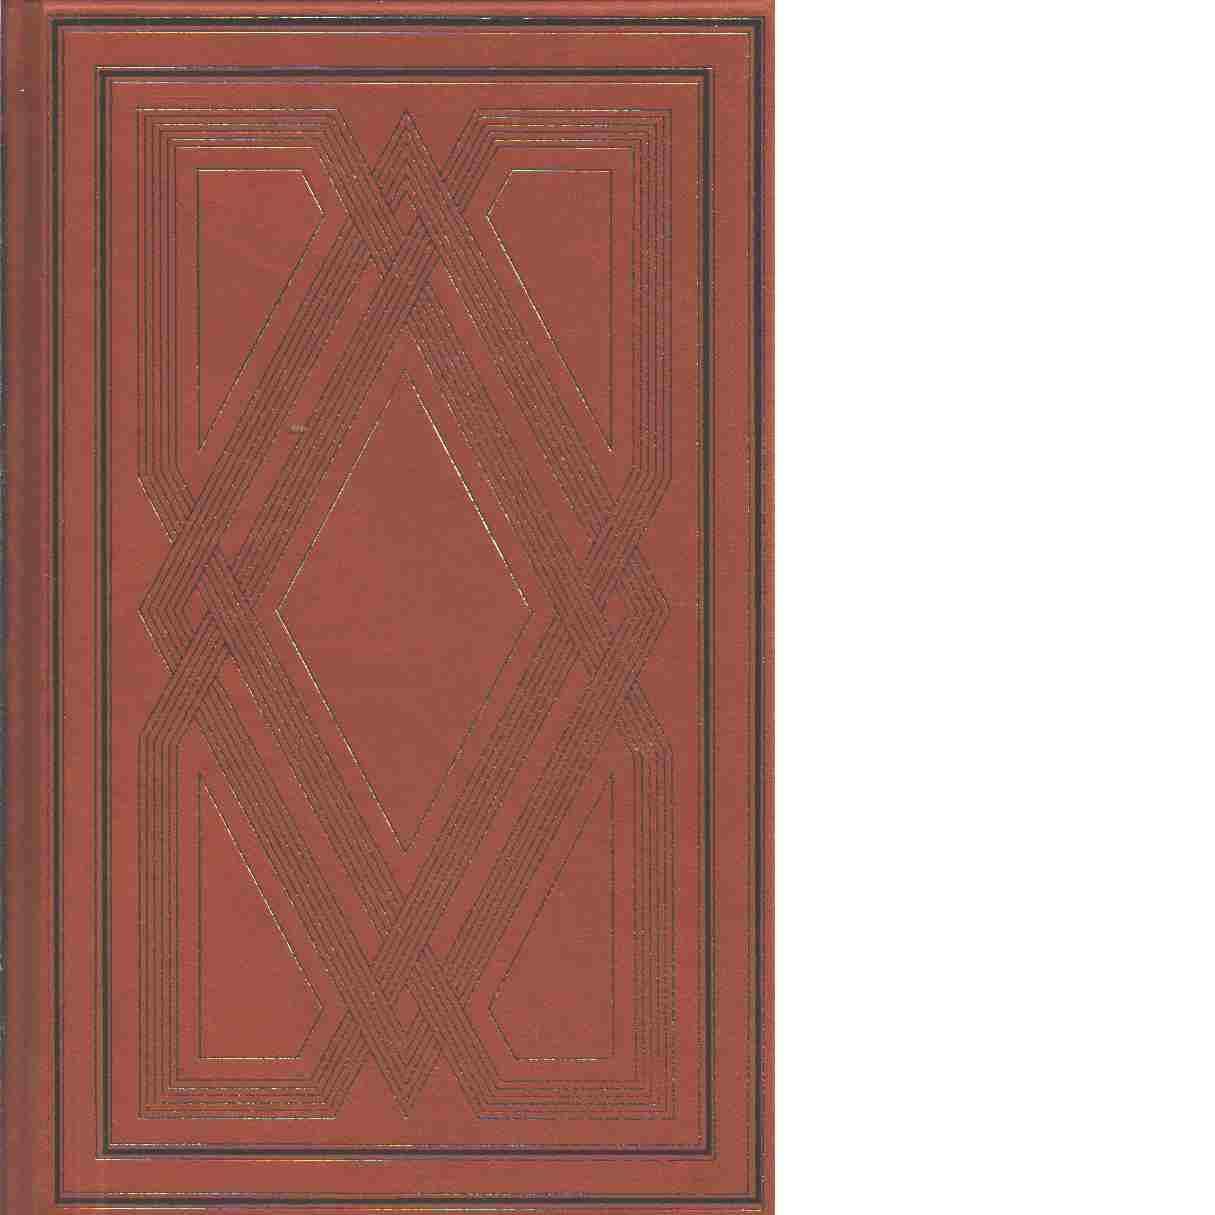 Svindlande höjder - Brontë, Emily Jane